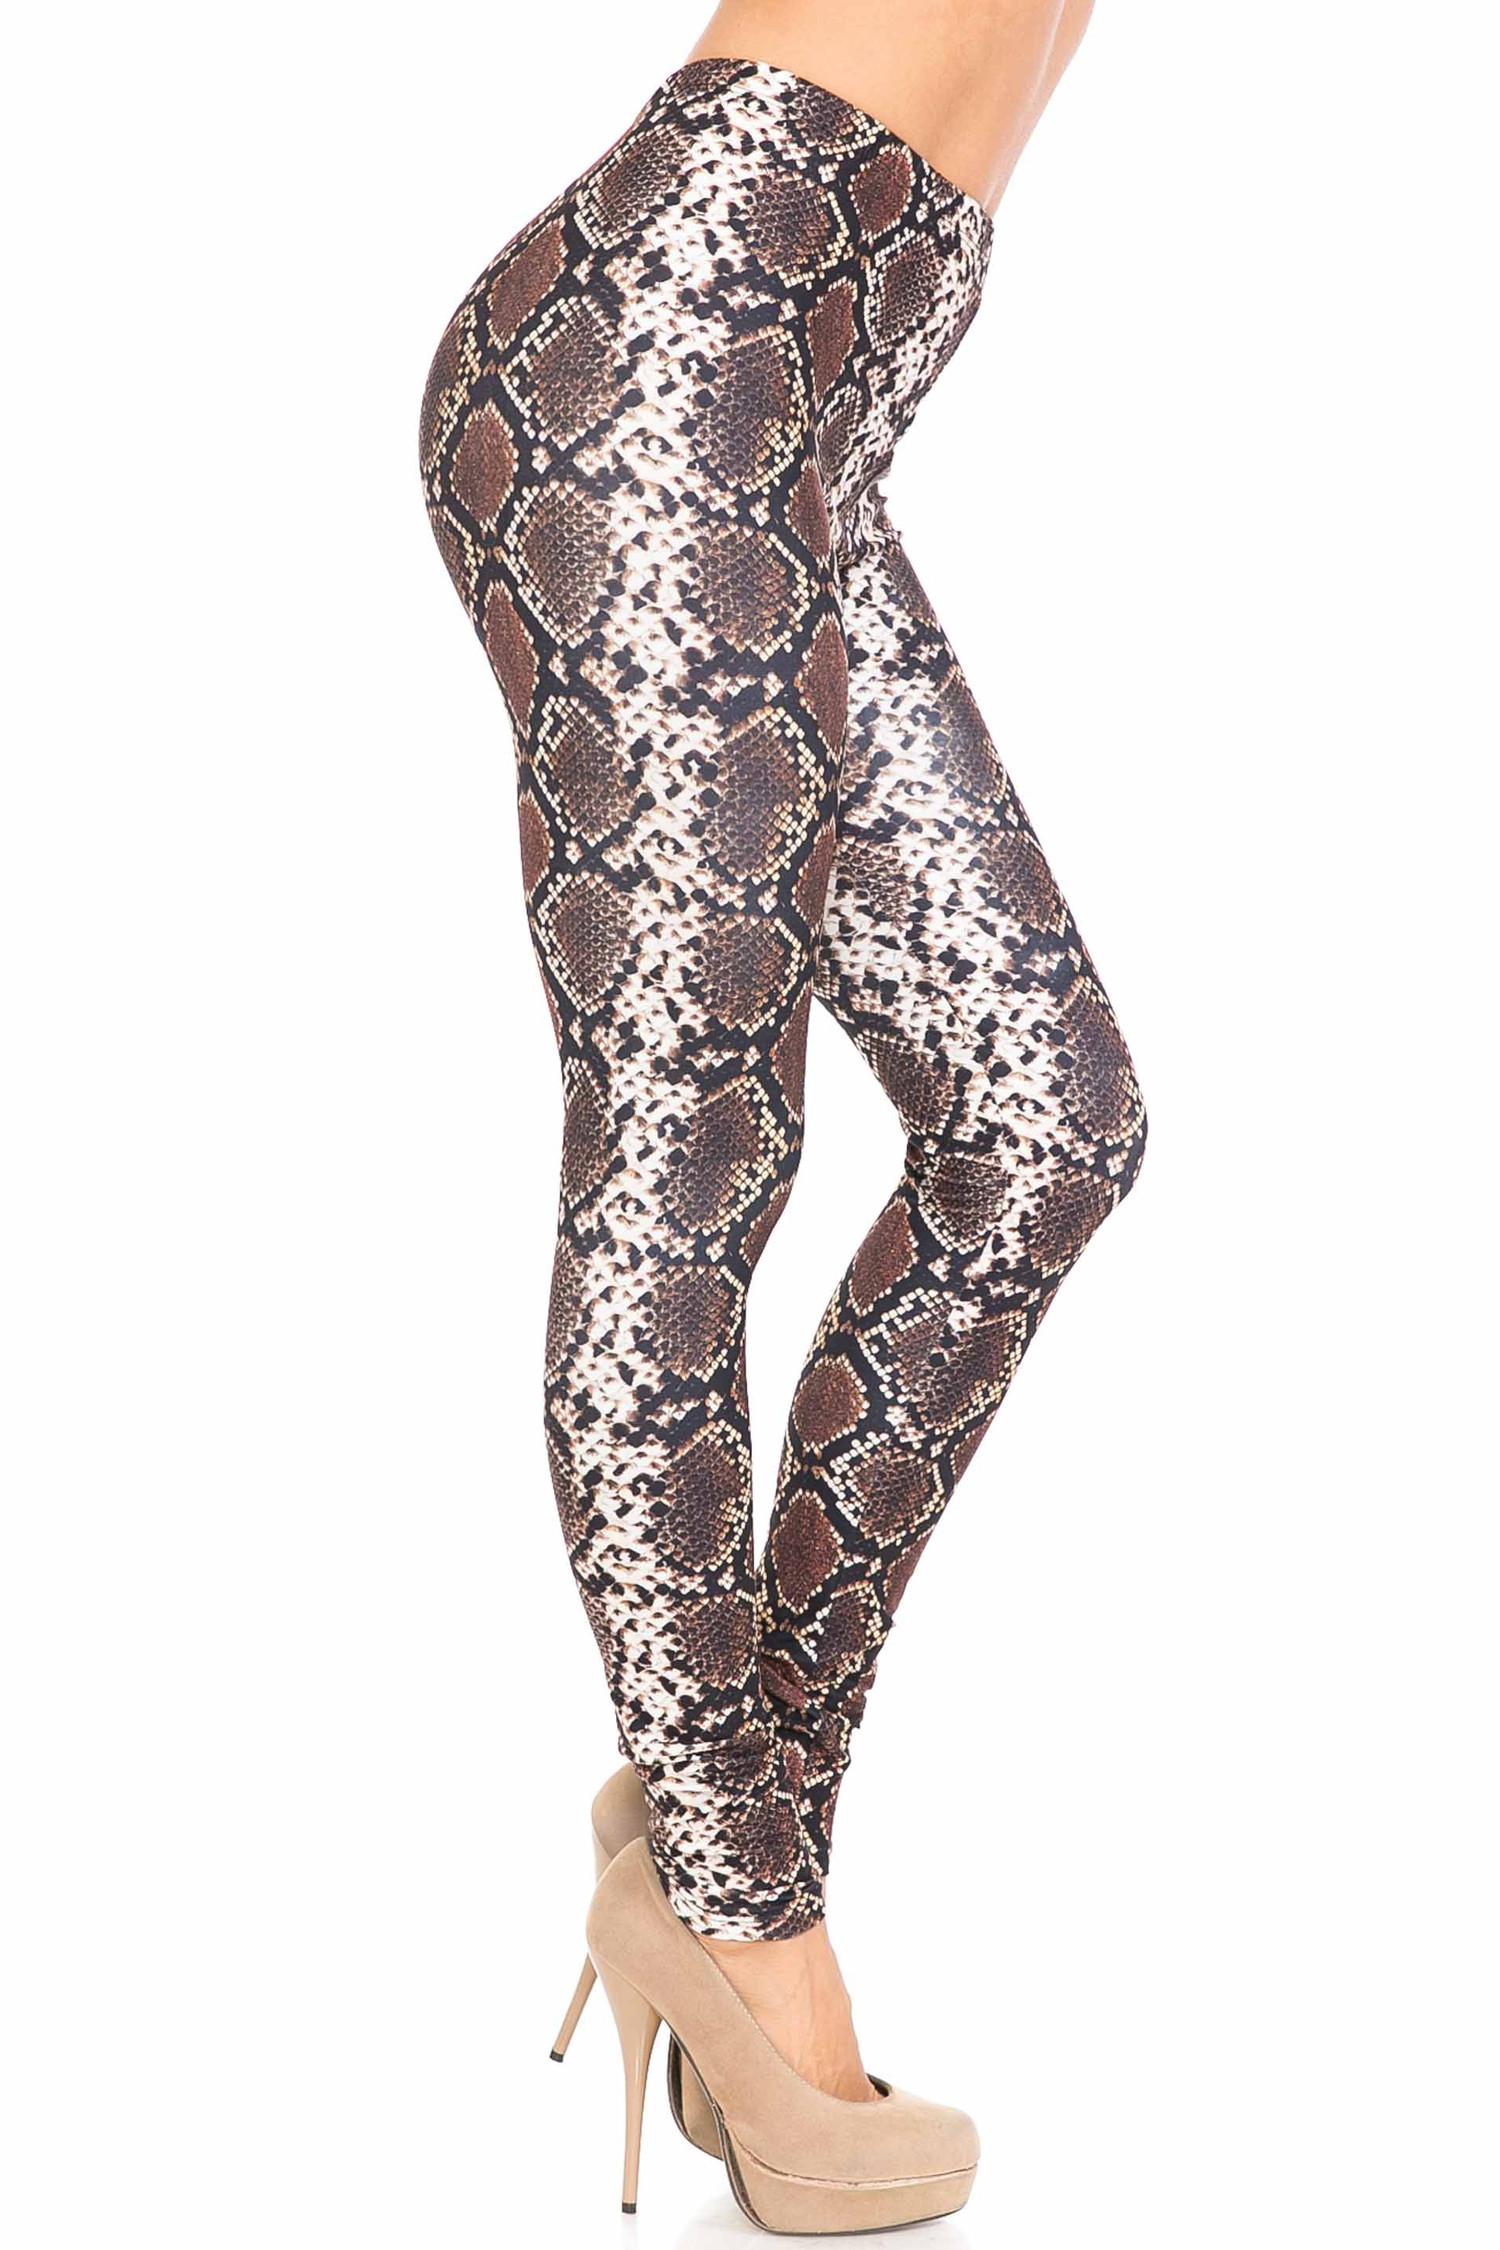 Right side of Creamy Soft Brown Boa Leggings - USA Fashion™